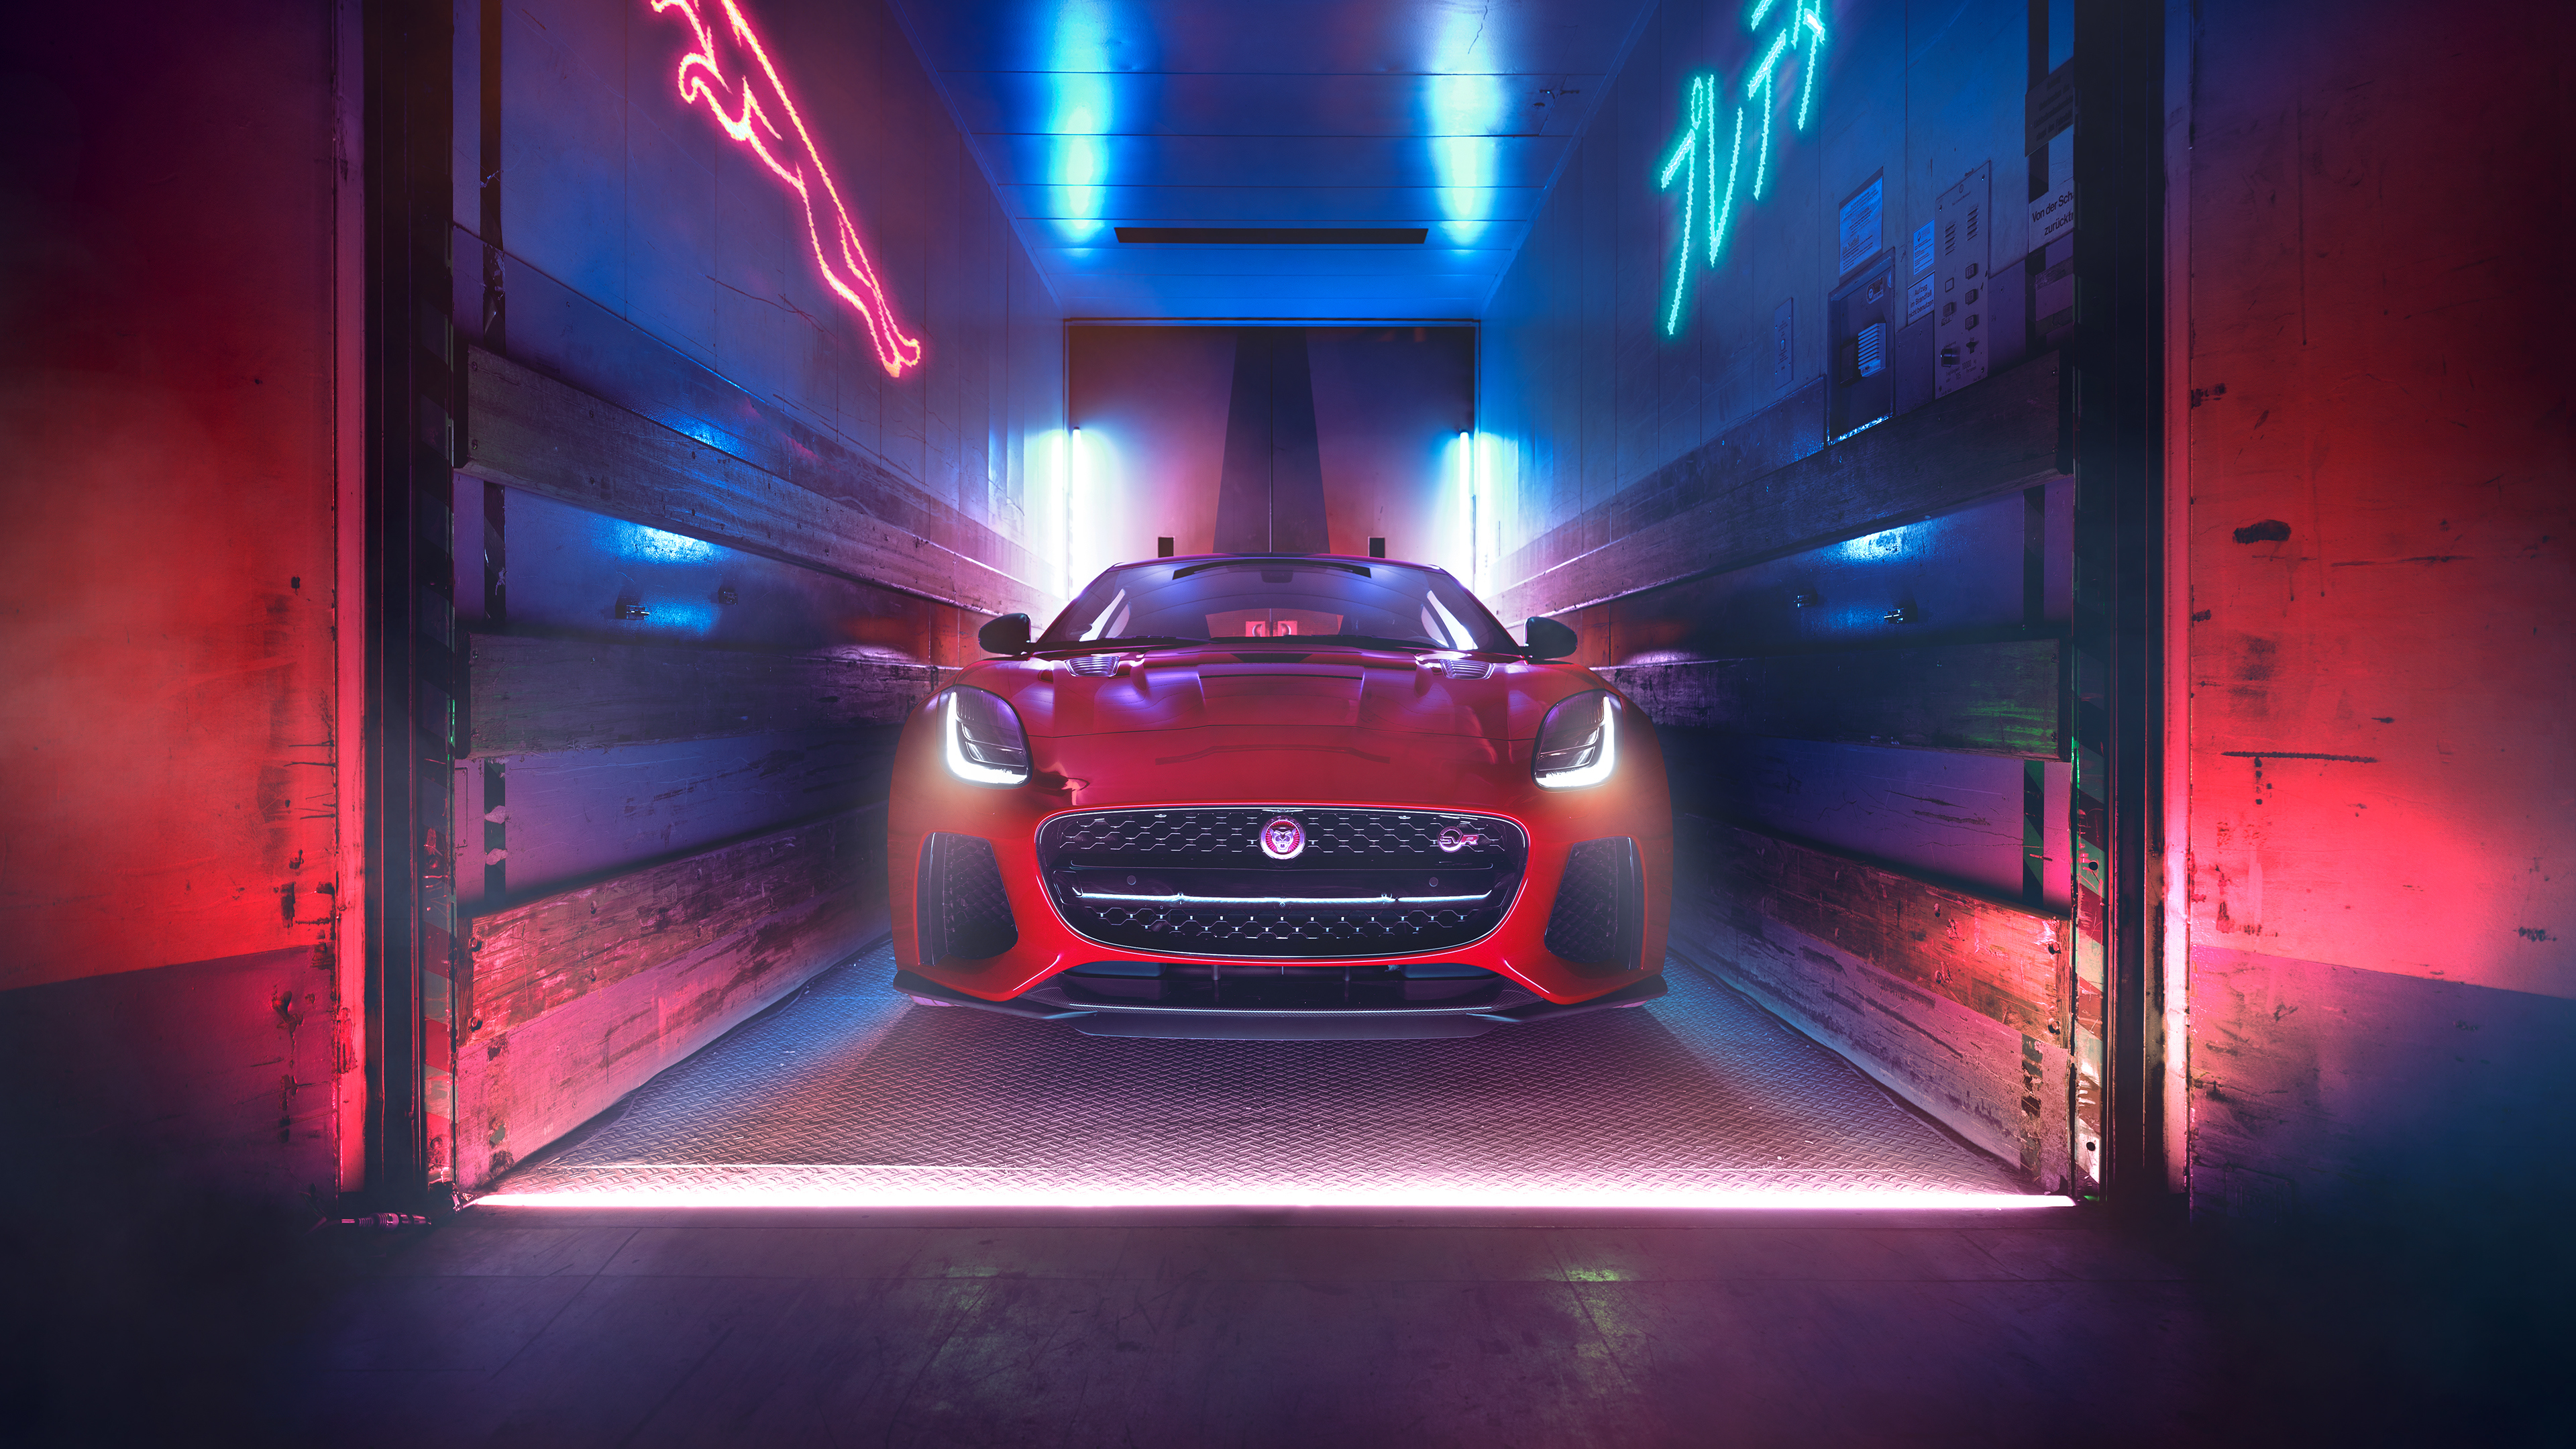 jaguar f type 2018 front view 4k 1539112069 - Jaguar F Type 2018 Front View 4k - jaguar wallpapers, jaguar f type wallpapers, hd-wallpapers, cars wallpapers, 4k-wallpapers, 2018 cars wallpapers